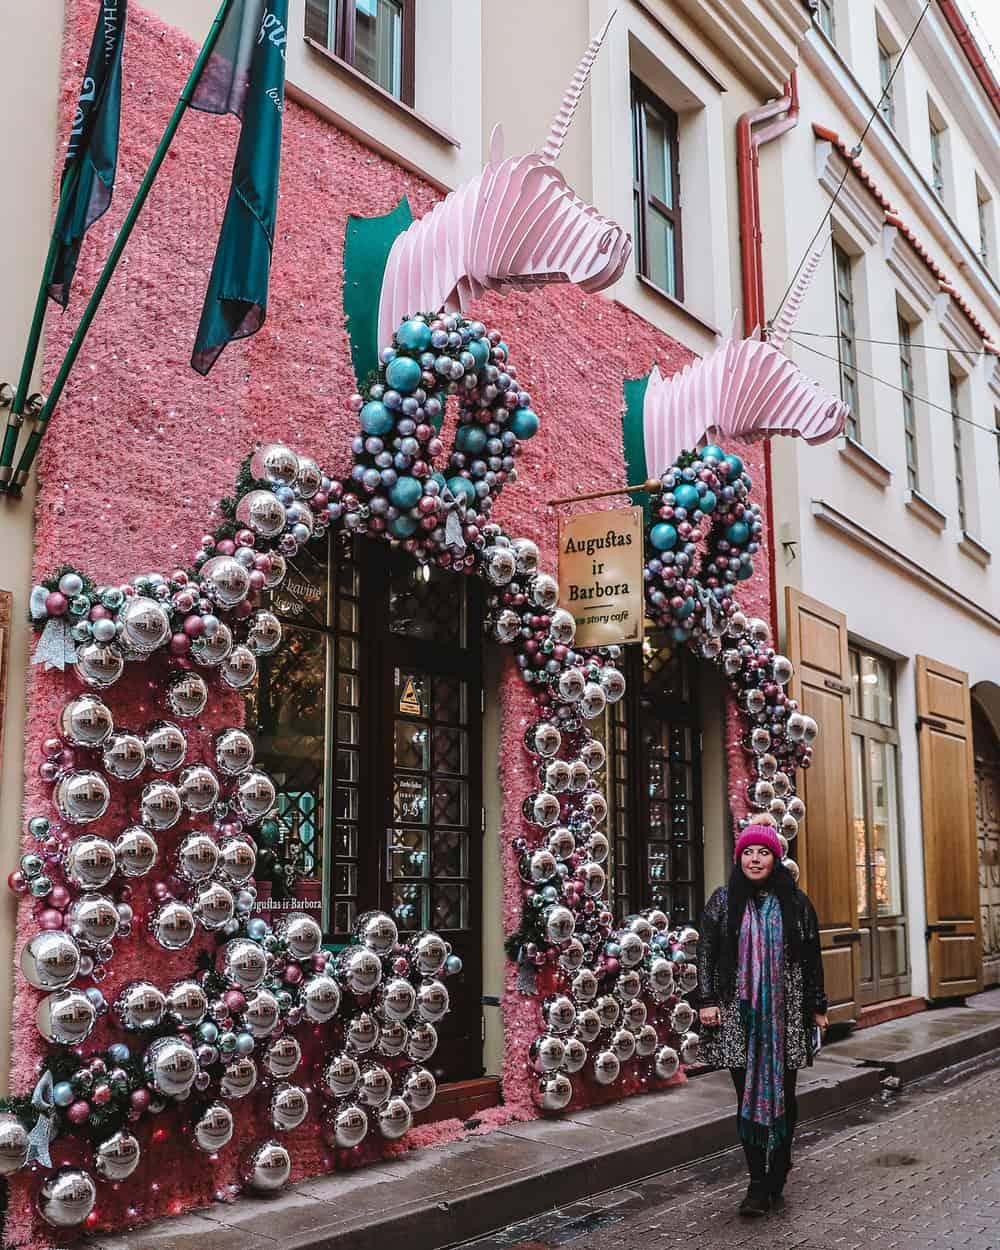 Augustas ir Barbora Love Story Café | Instagram cafe in Vilnius